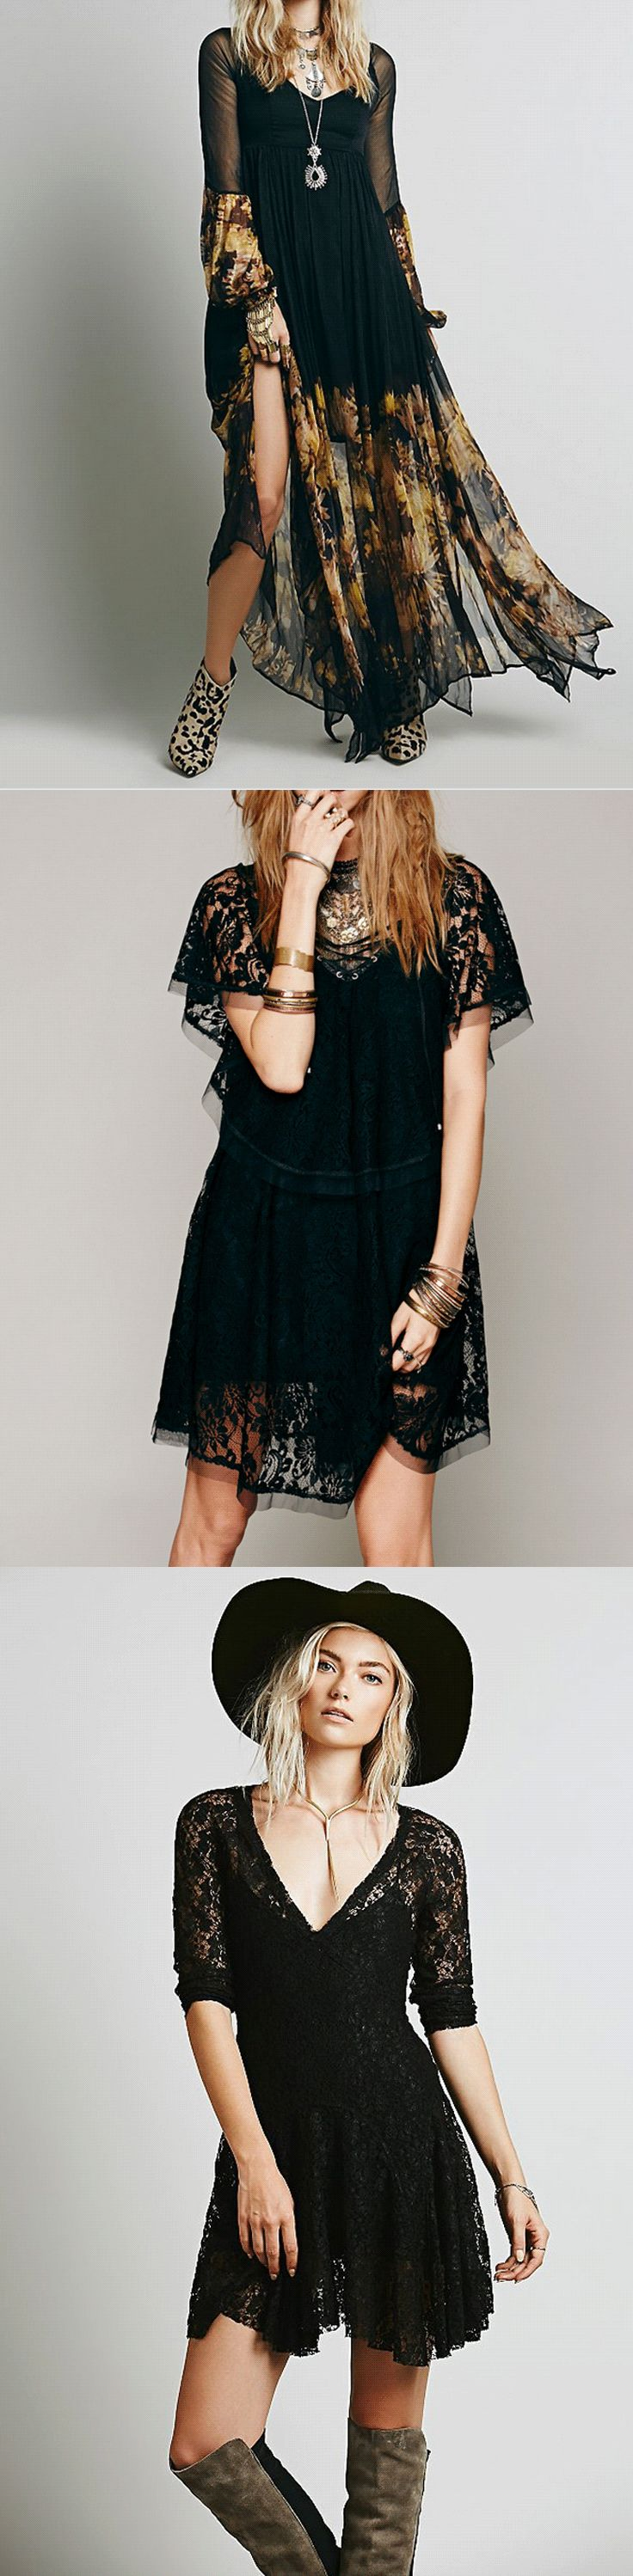 Shop black goth witchy gypsy dresses at RebelsMarket!